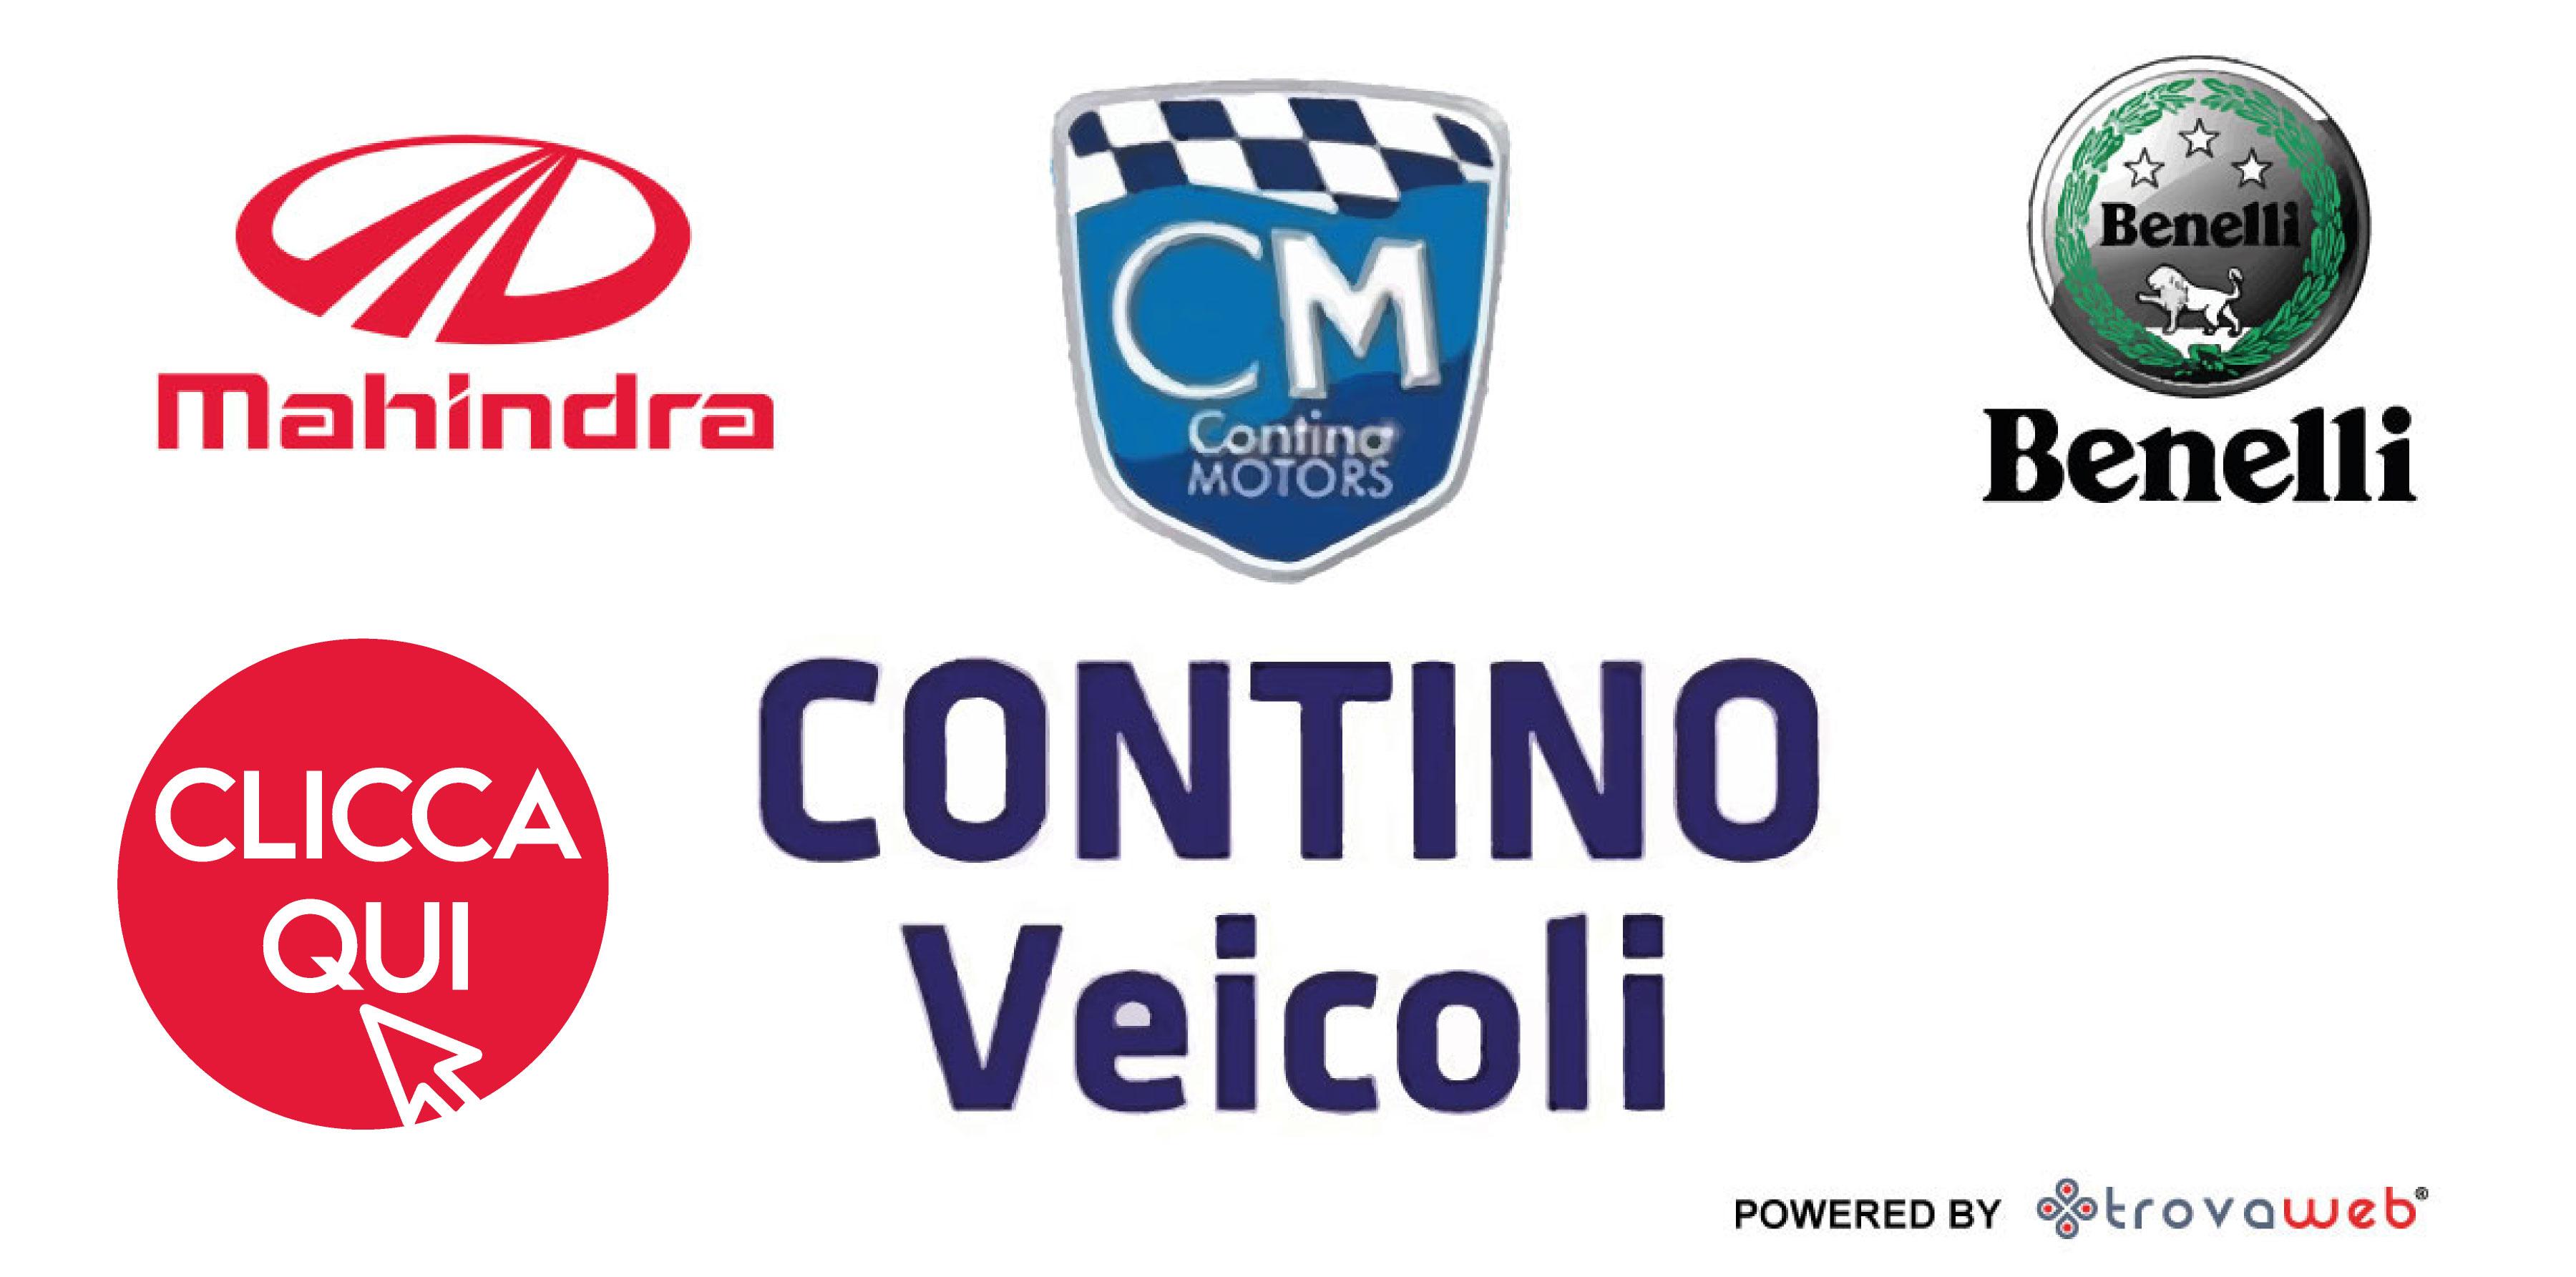 Concessionario Honda Contino Veicoli - Agrigento